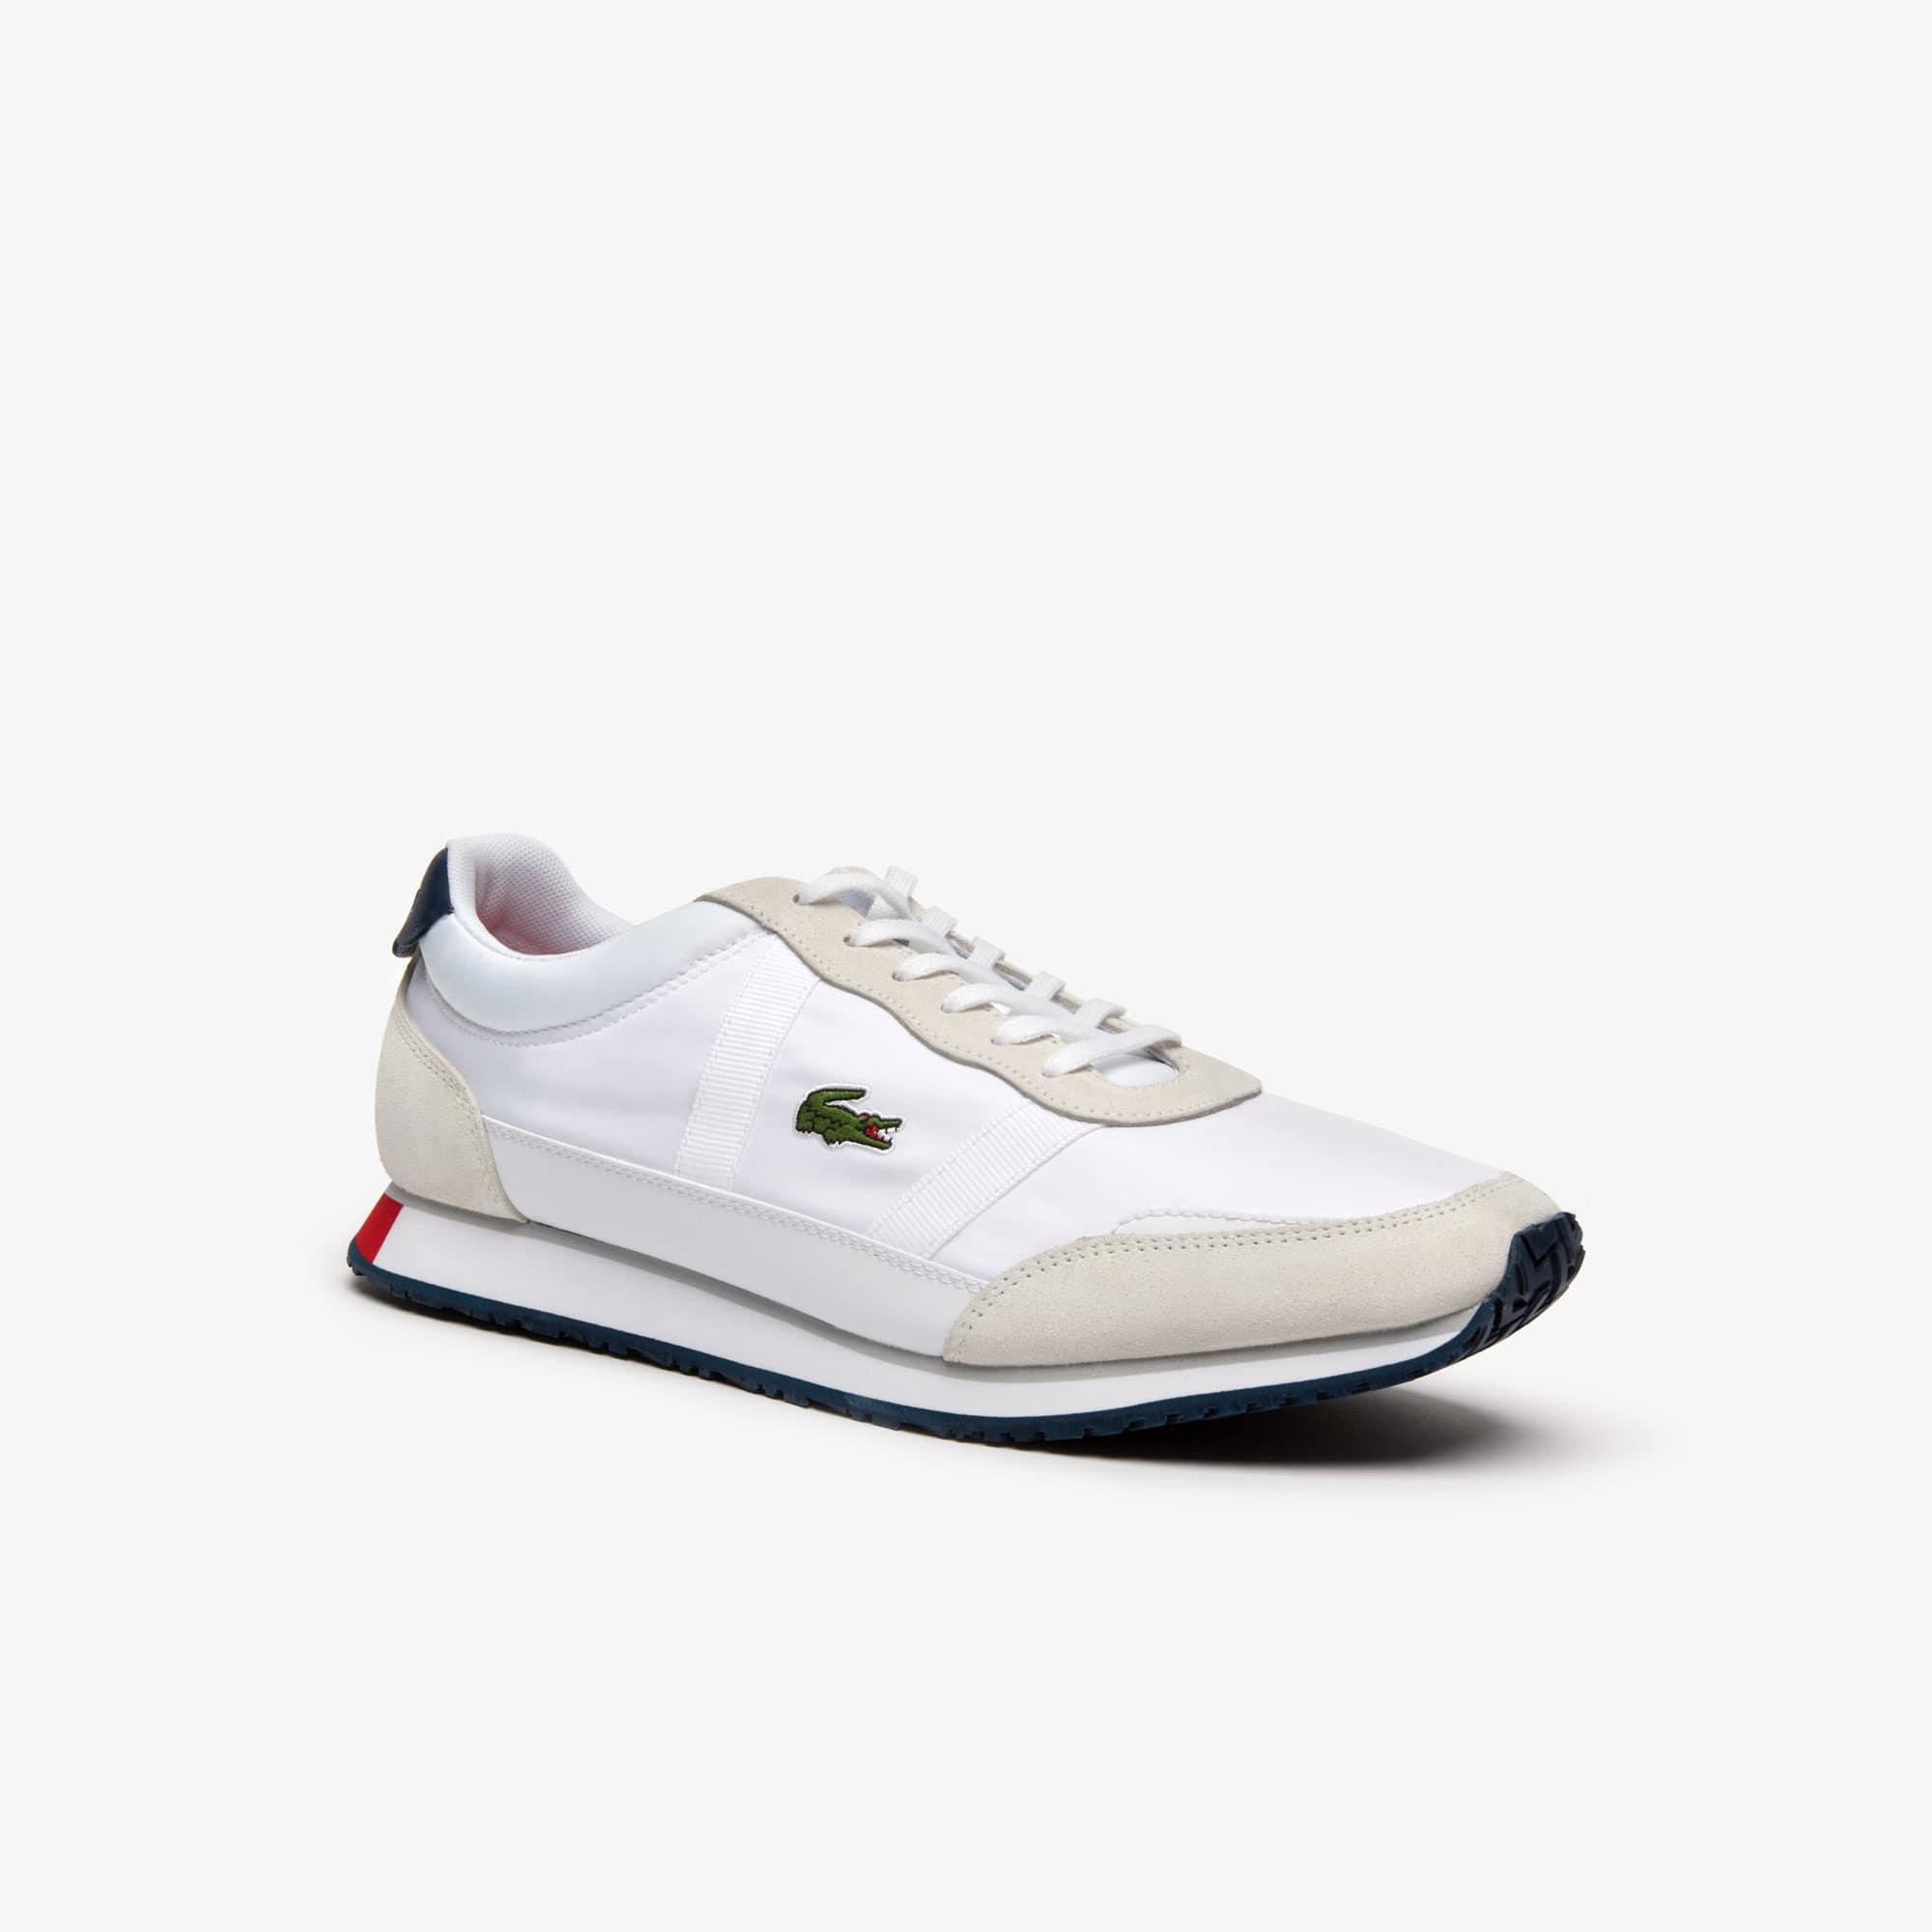 Men's Partner Retro Sneakers   LACOSTE